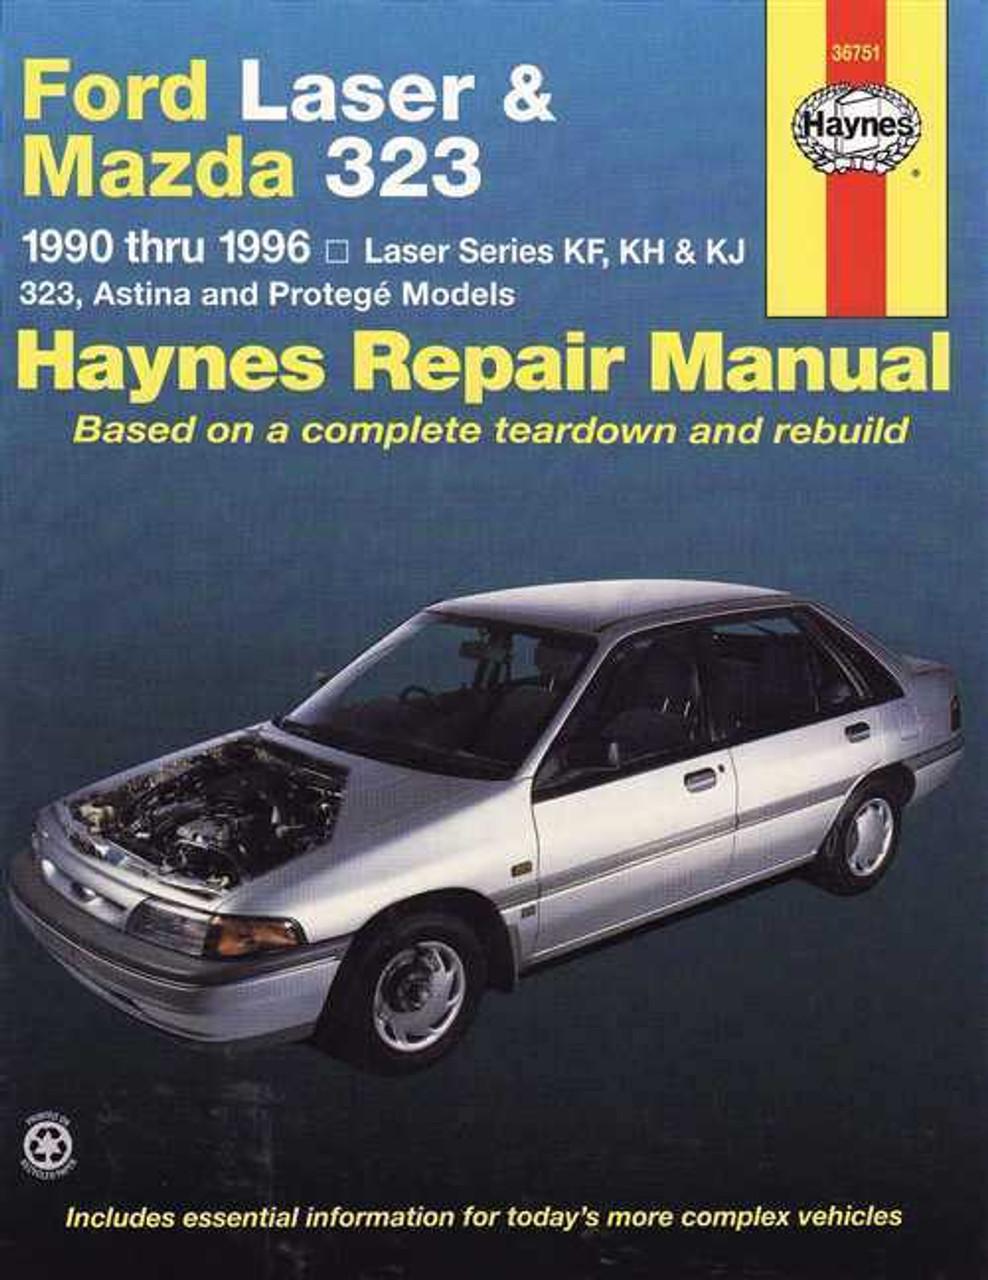 mazda 323 service repair manual fr free owners manual u2022 rh wordworksbysea com Interior Mazda Astina Mazda Astina Modif